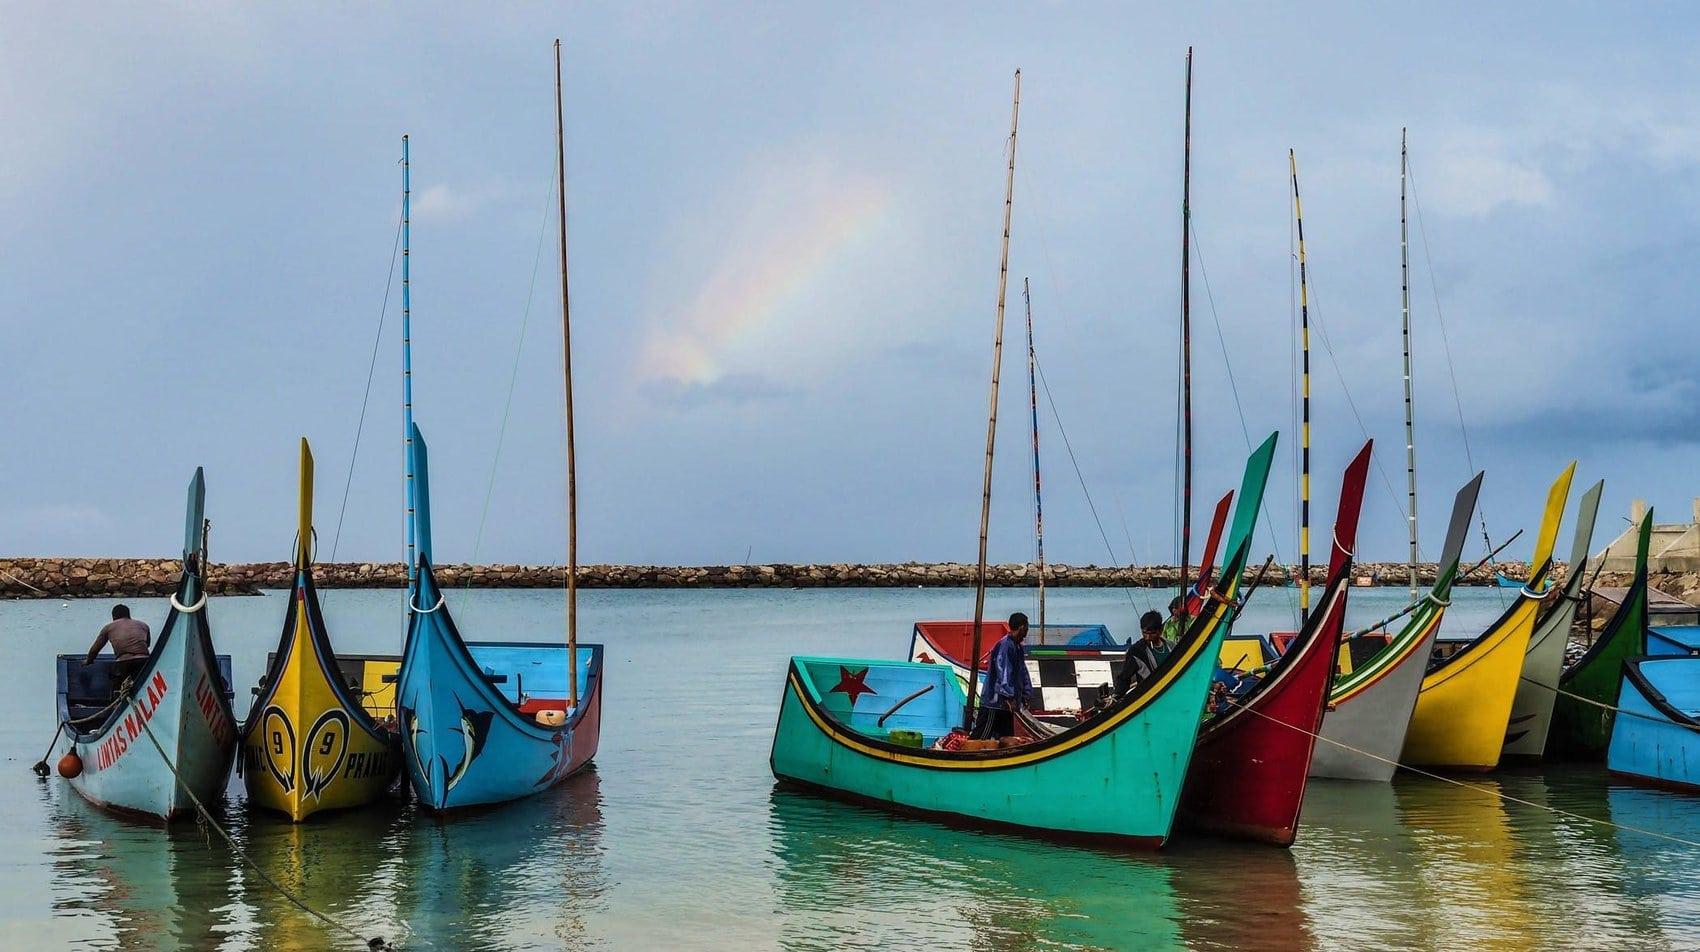 Pulau Weh bateau de pêches